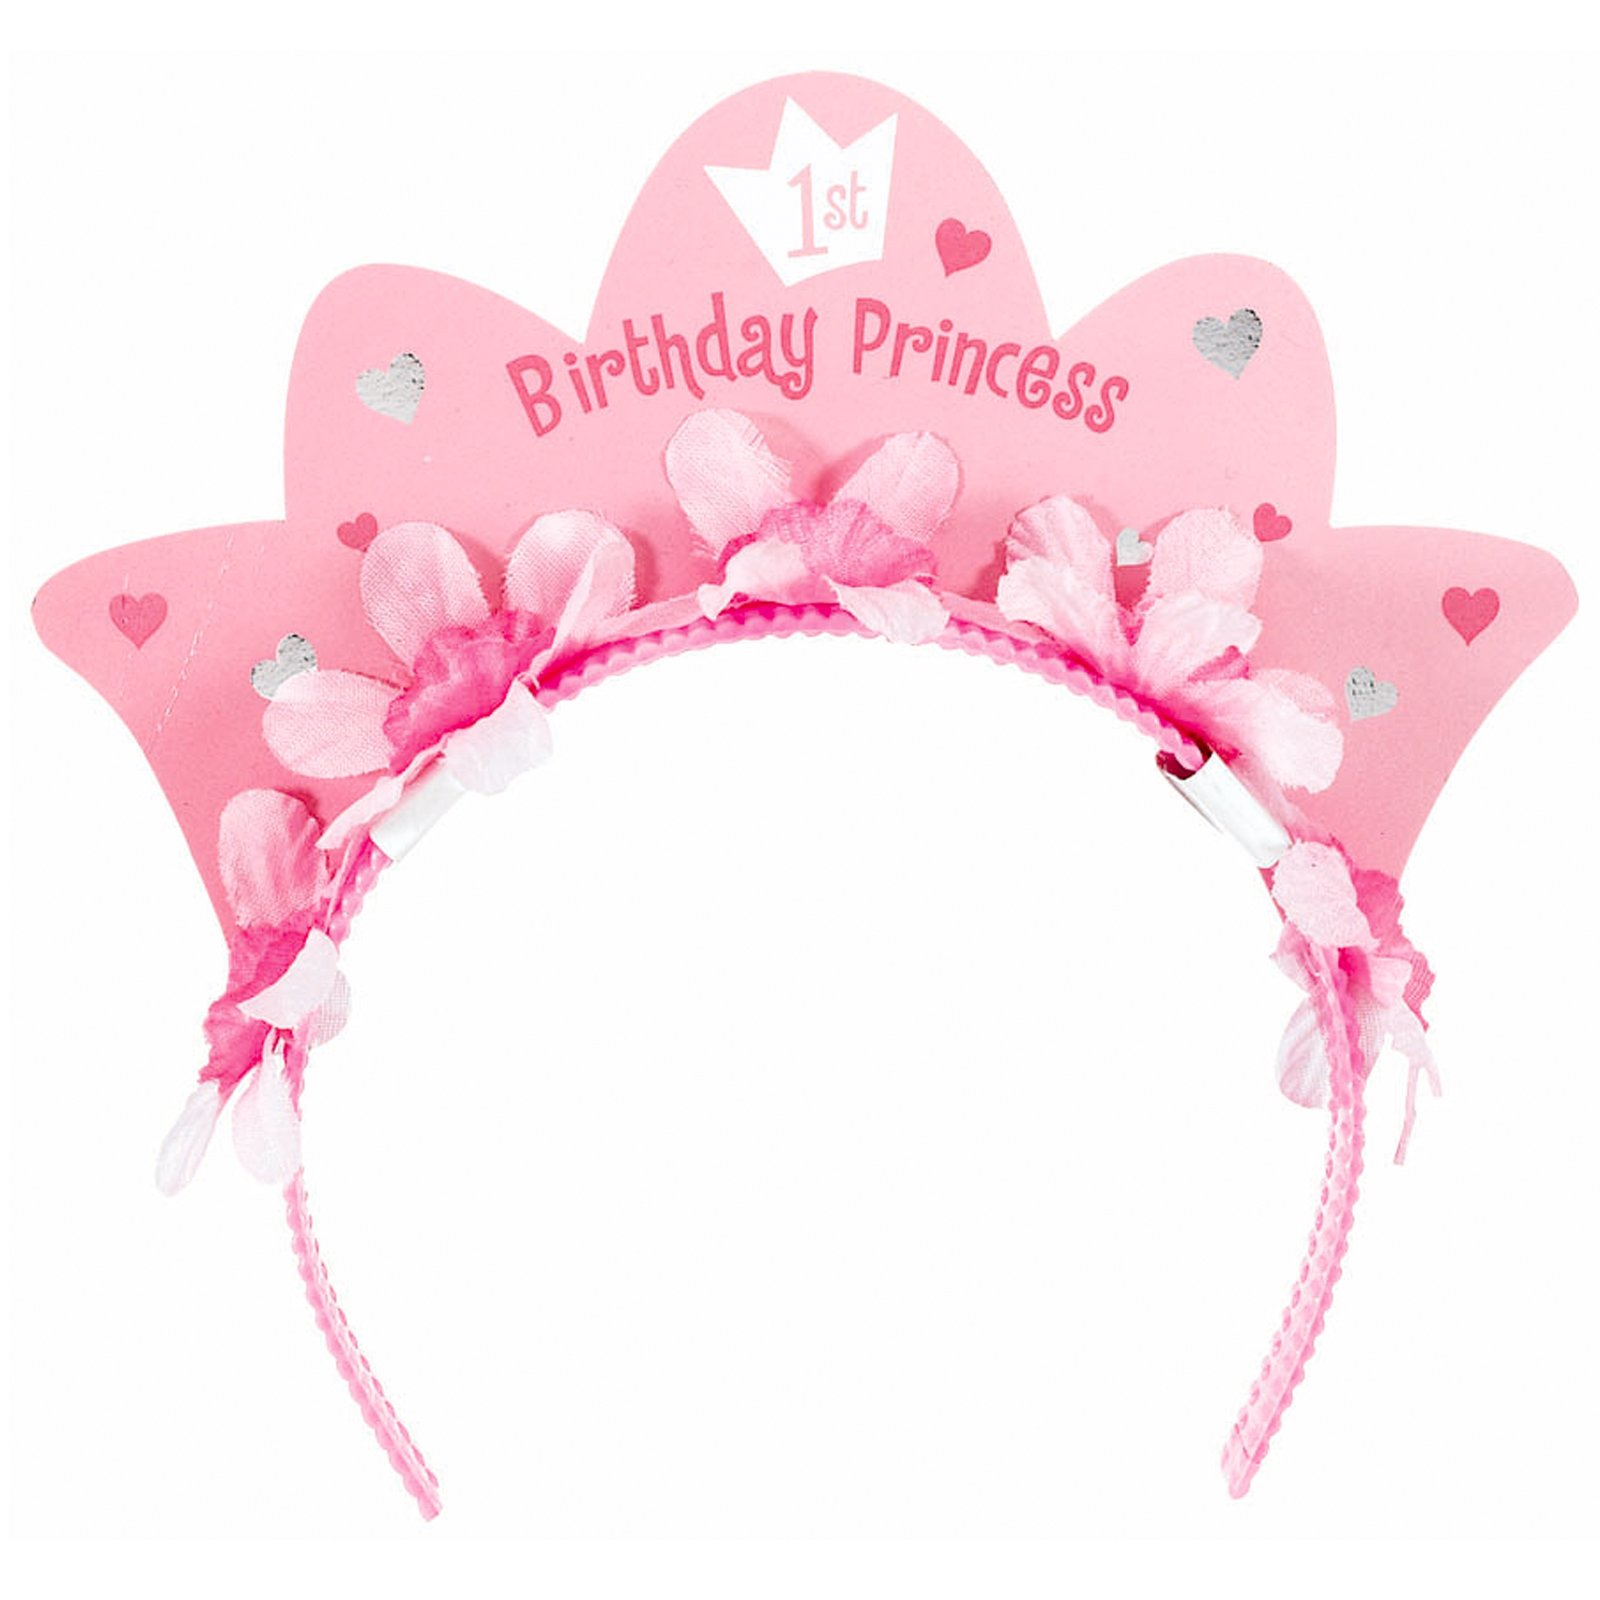 Headband clipart pink Clipart Clipart#2179743 Veil Tiara Birthday